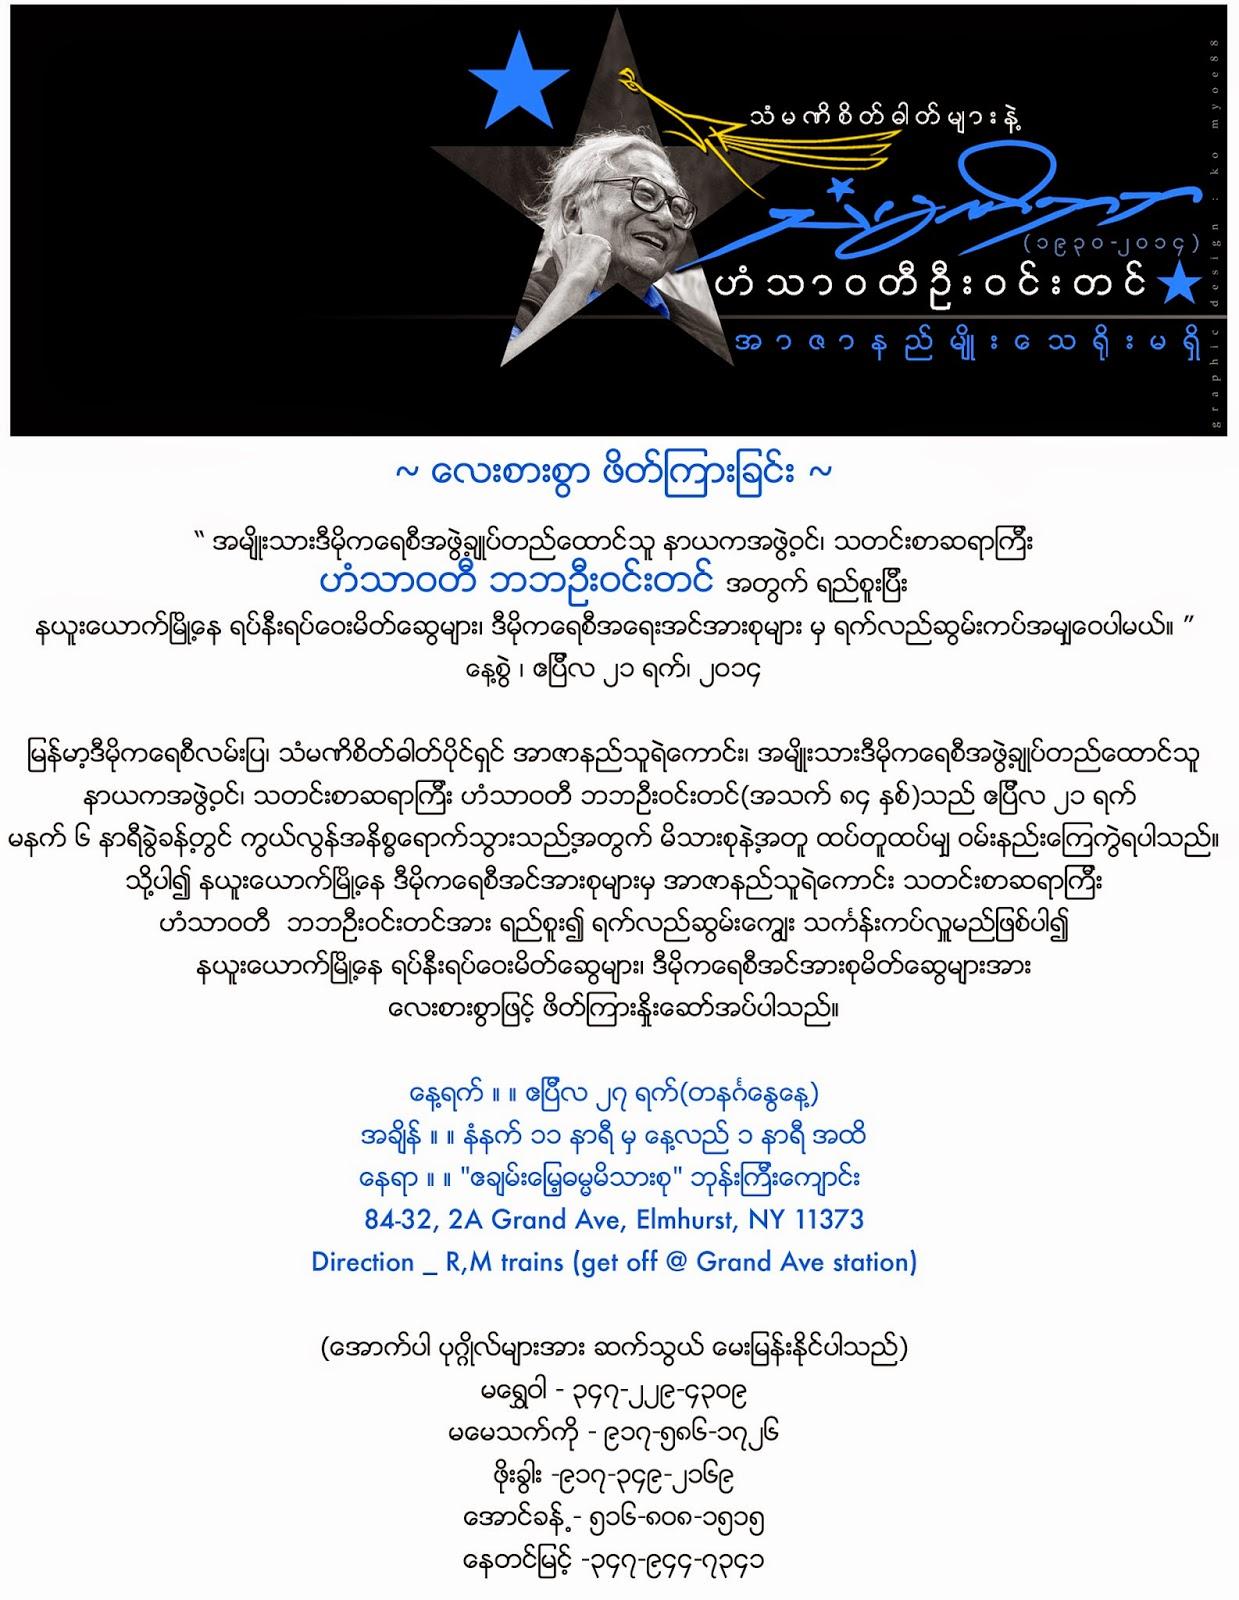 New York Burmese Community – ဟံသာ၀တီ  ဘဘဦးဝင္းတင္အား ရည္စူး၍ ရက္လည္ဆြမ္းေကြ်း သကၤန္းကပ္လႉမည္ျ